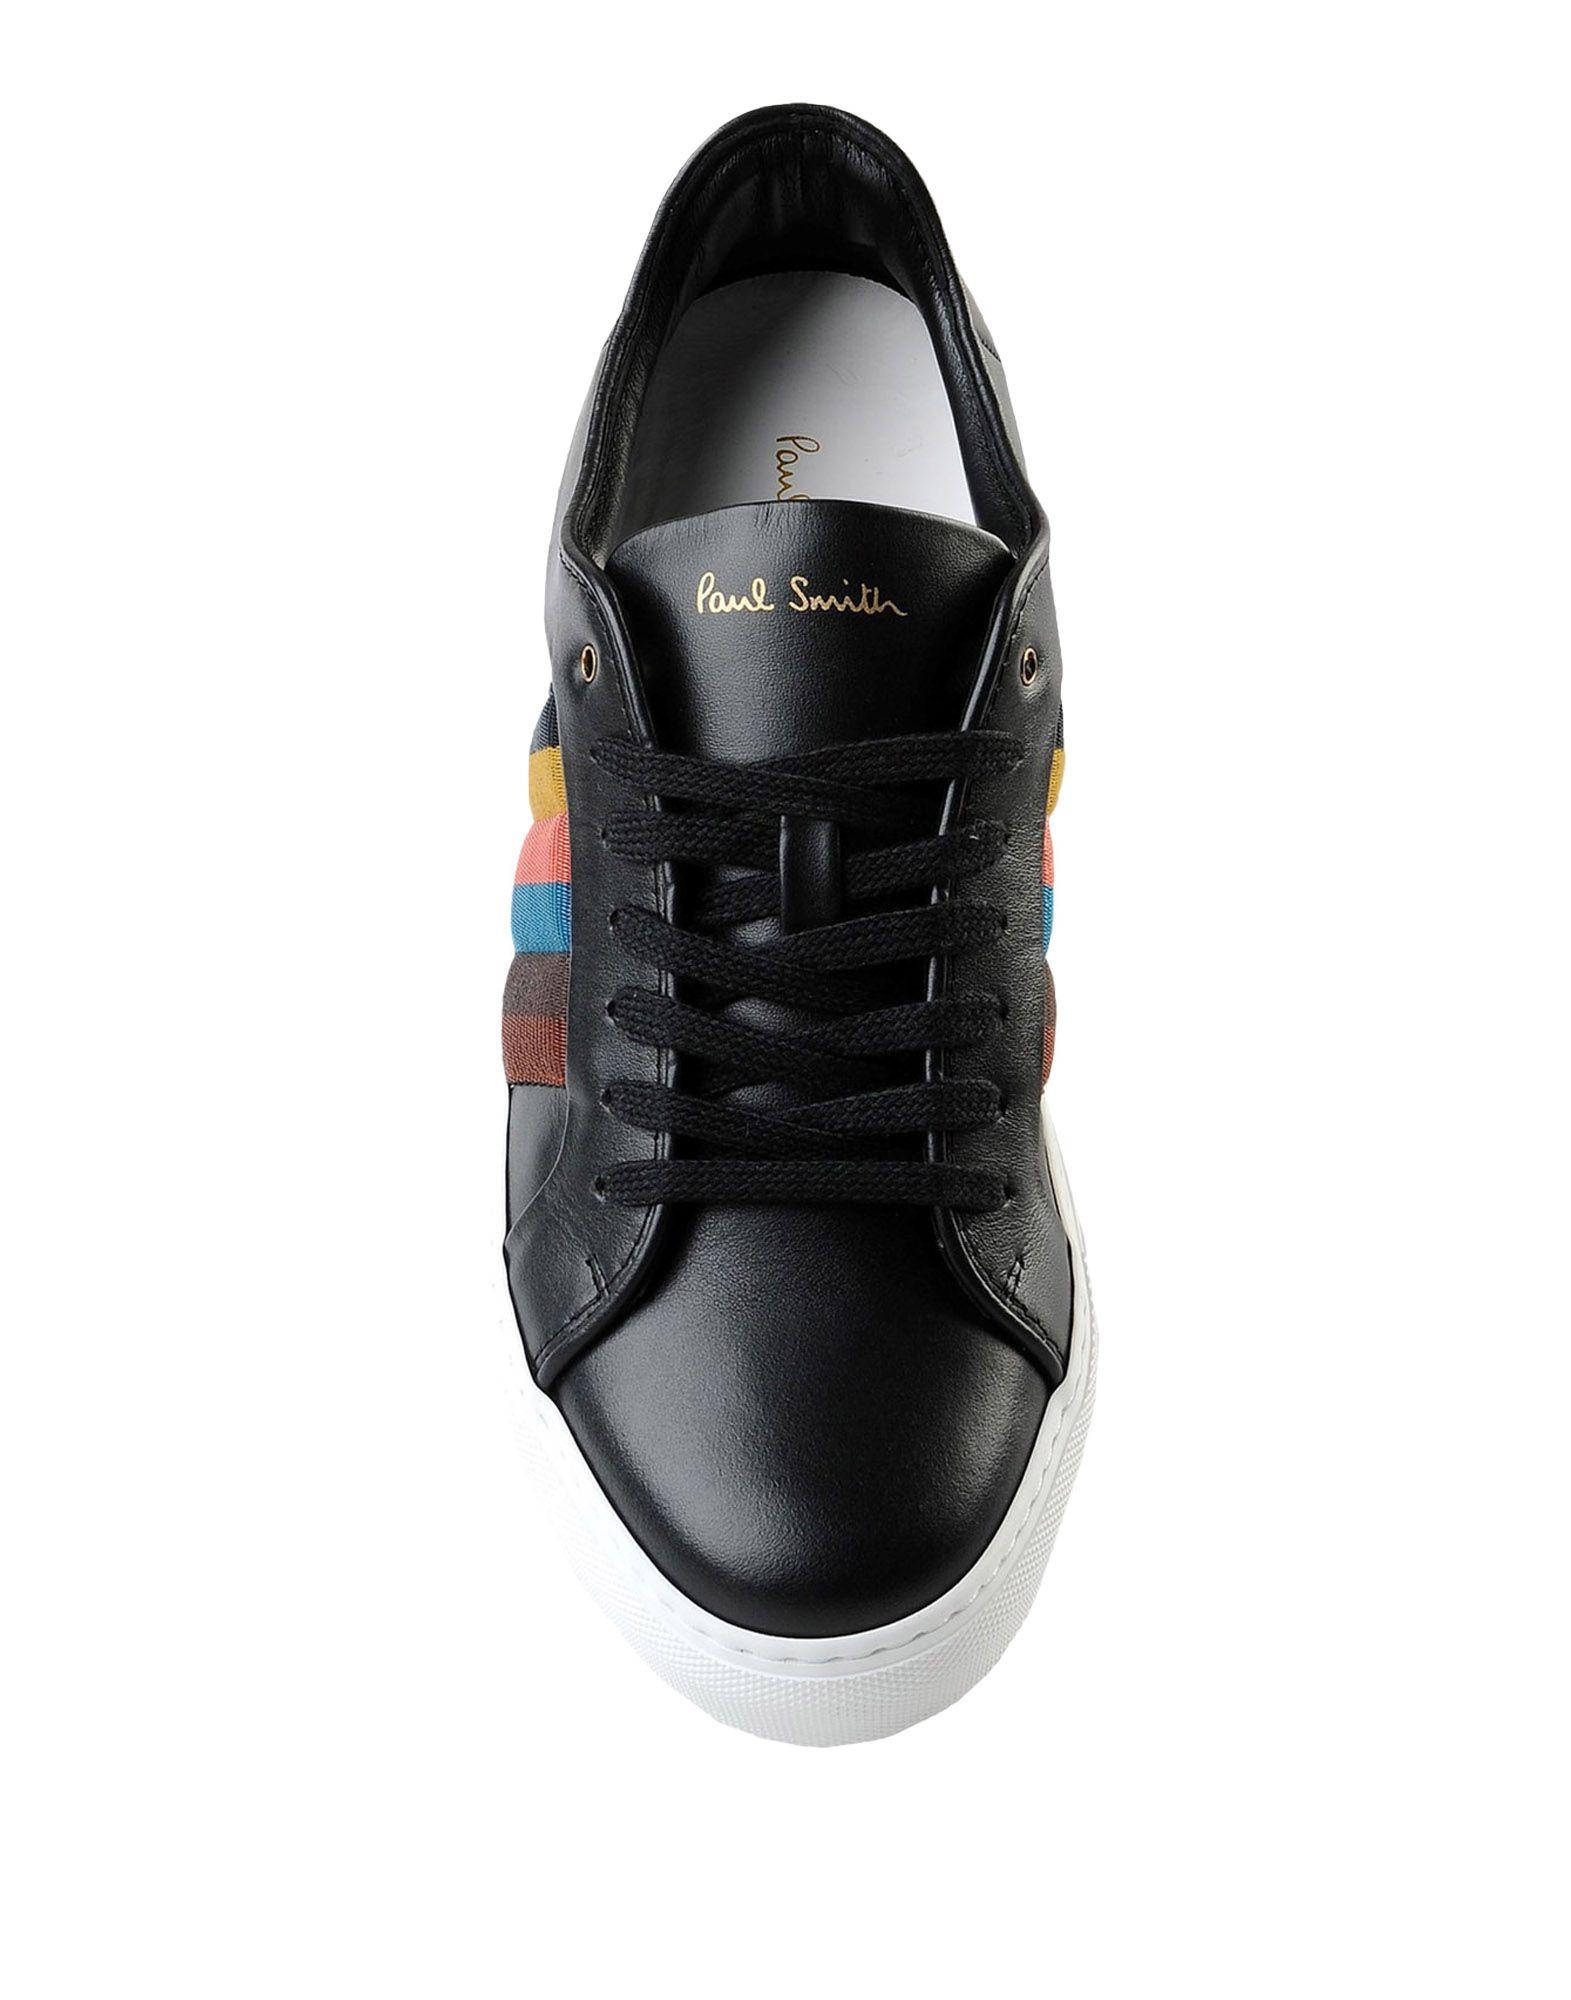 Paul Smith Sneakers Herren Gutes Preis-Leistungs-Verhältnis, lohnt es lohnt Preis-Leistungs-Verhältnis, sich 00bdd3